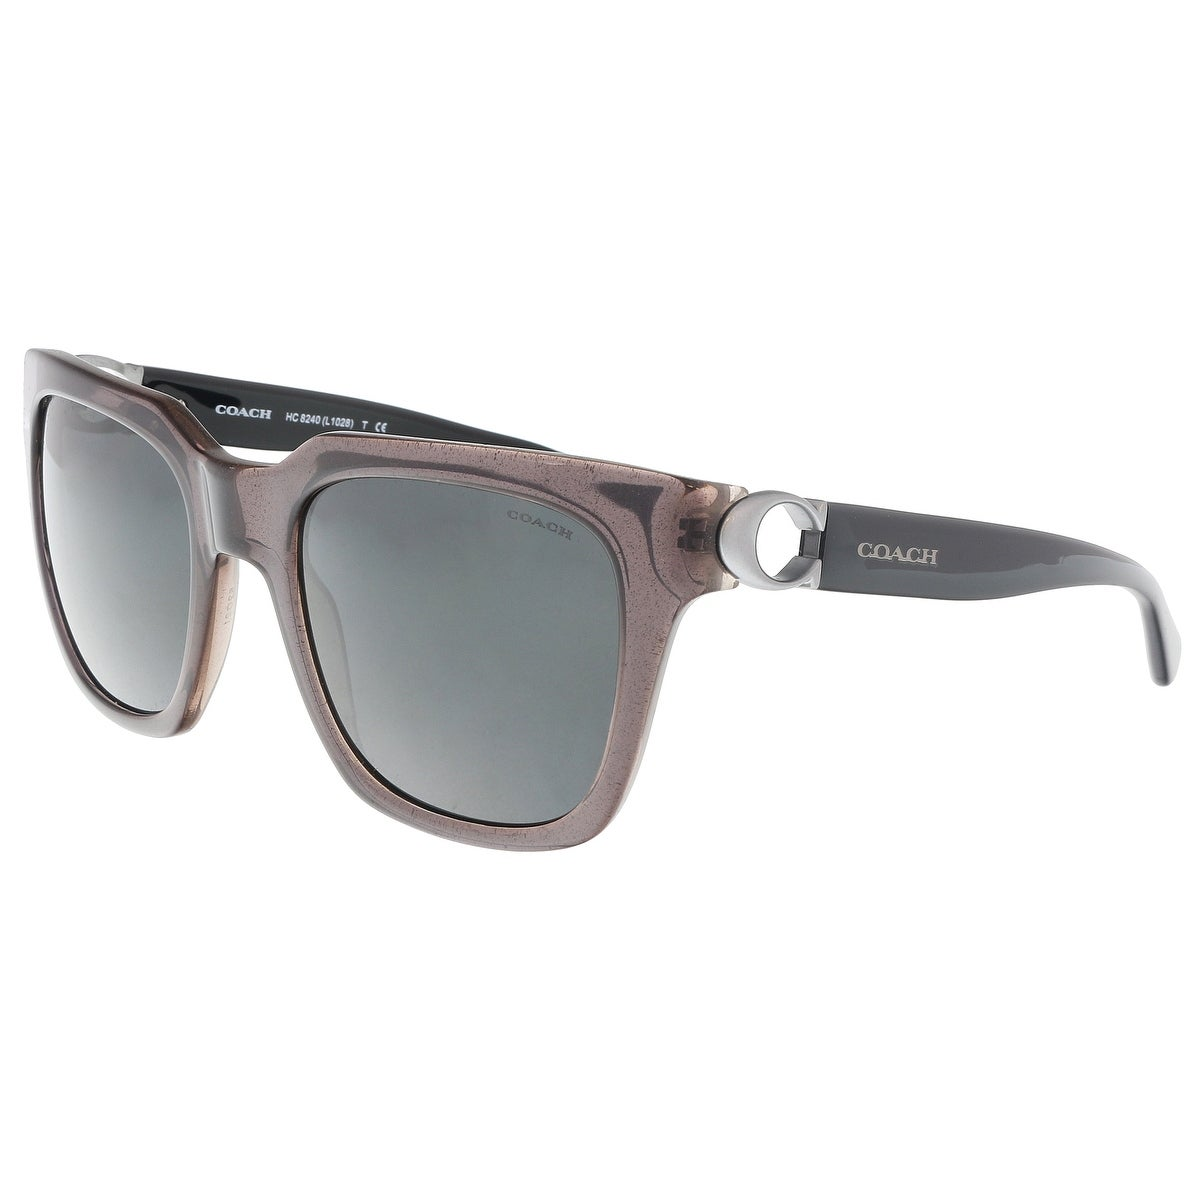 2b4809545ea5 Coach Women s Sunglasses